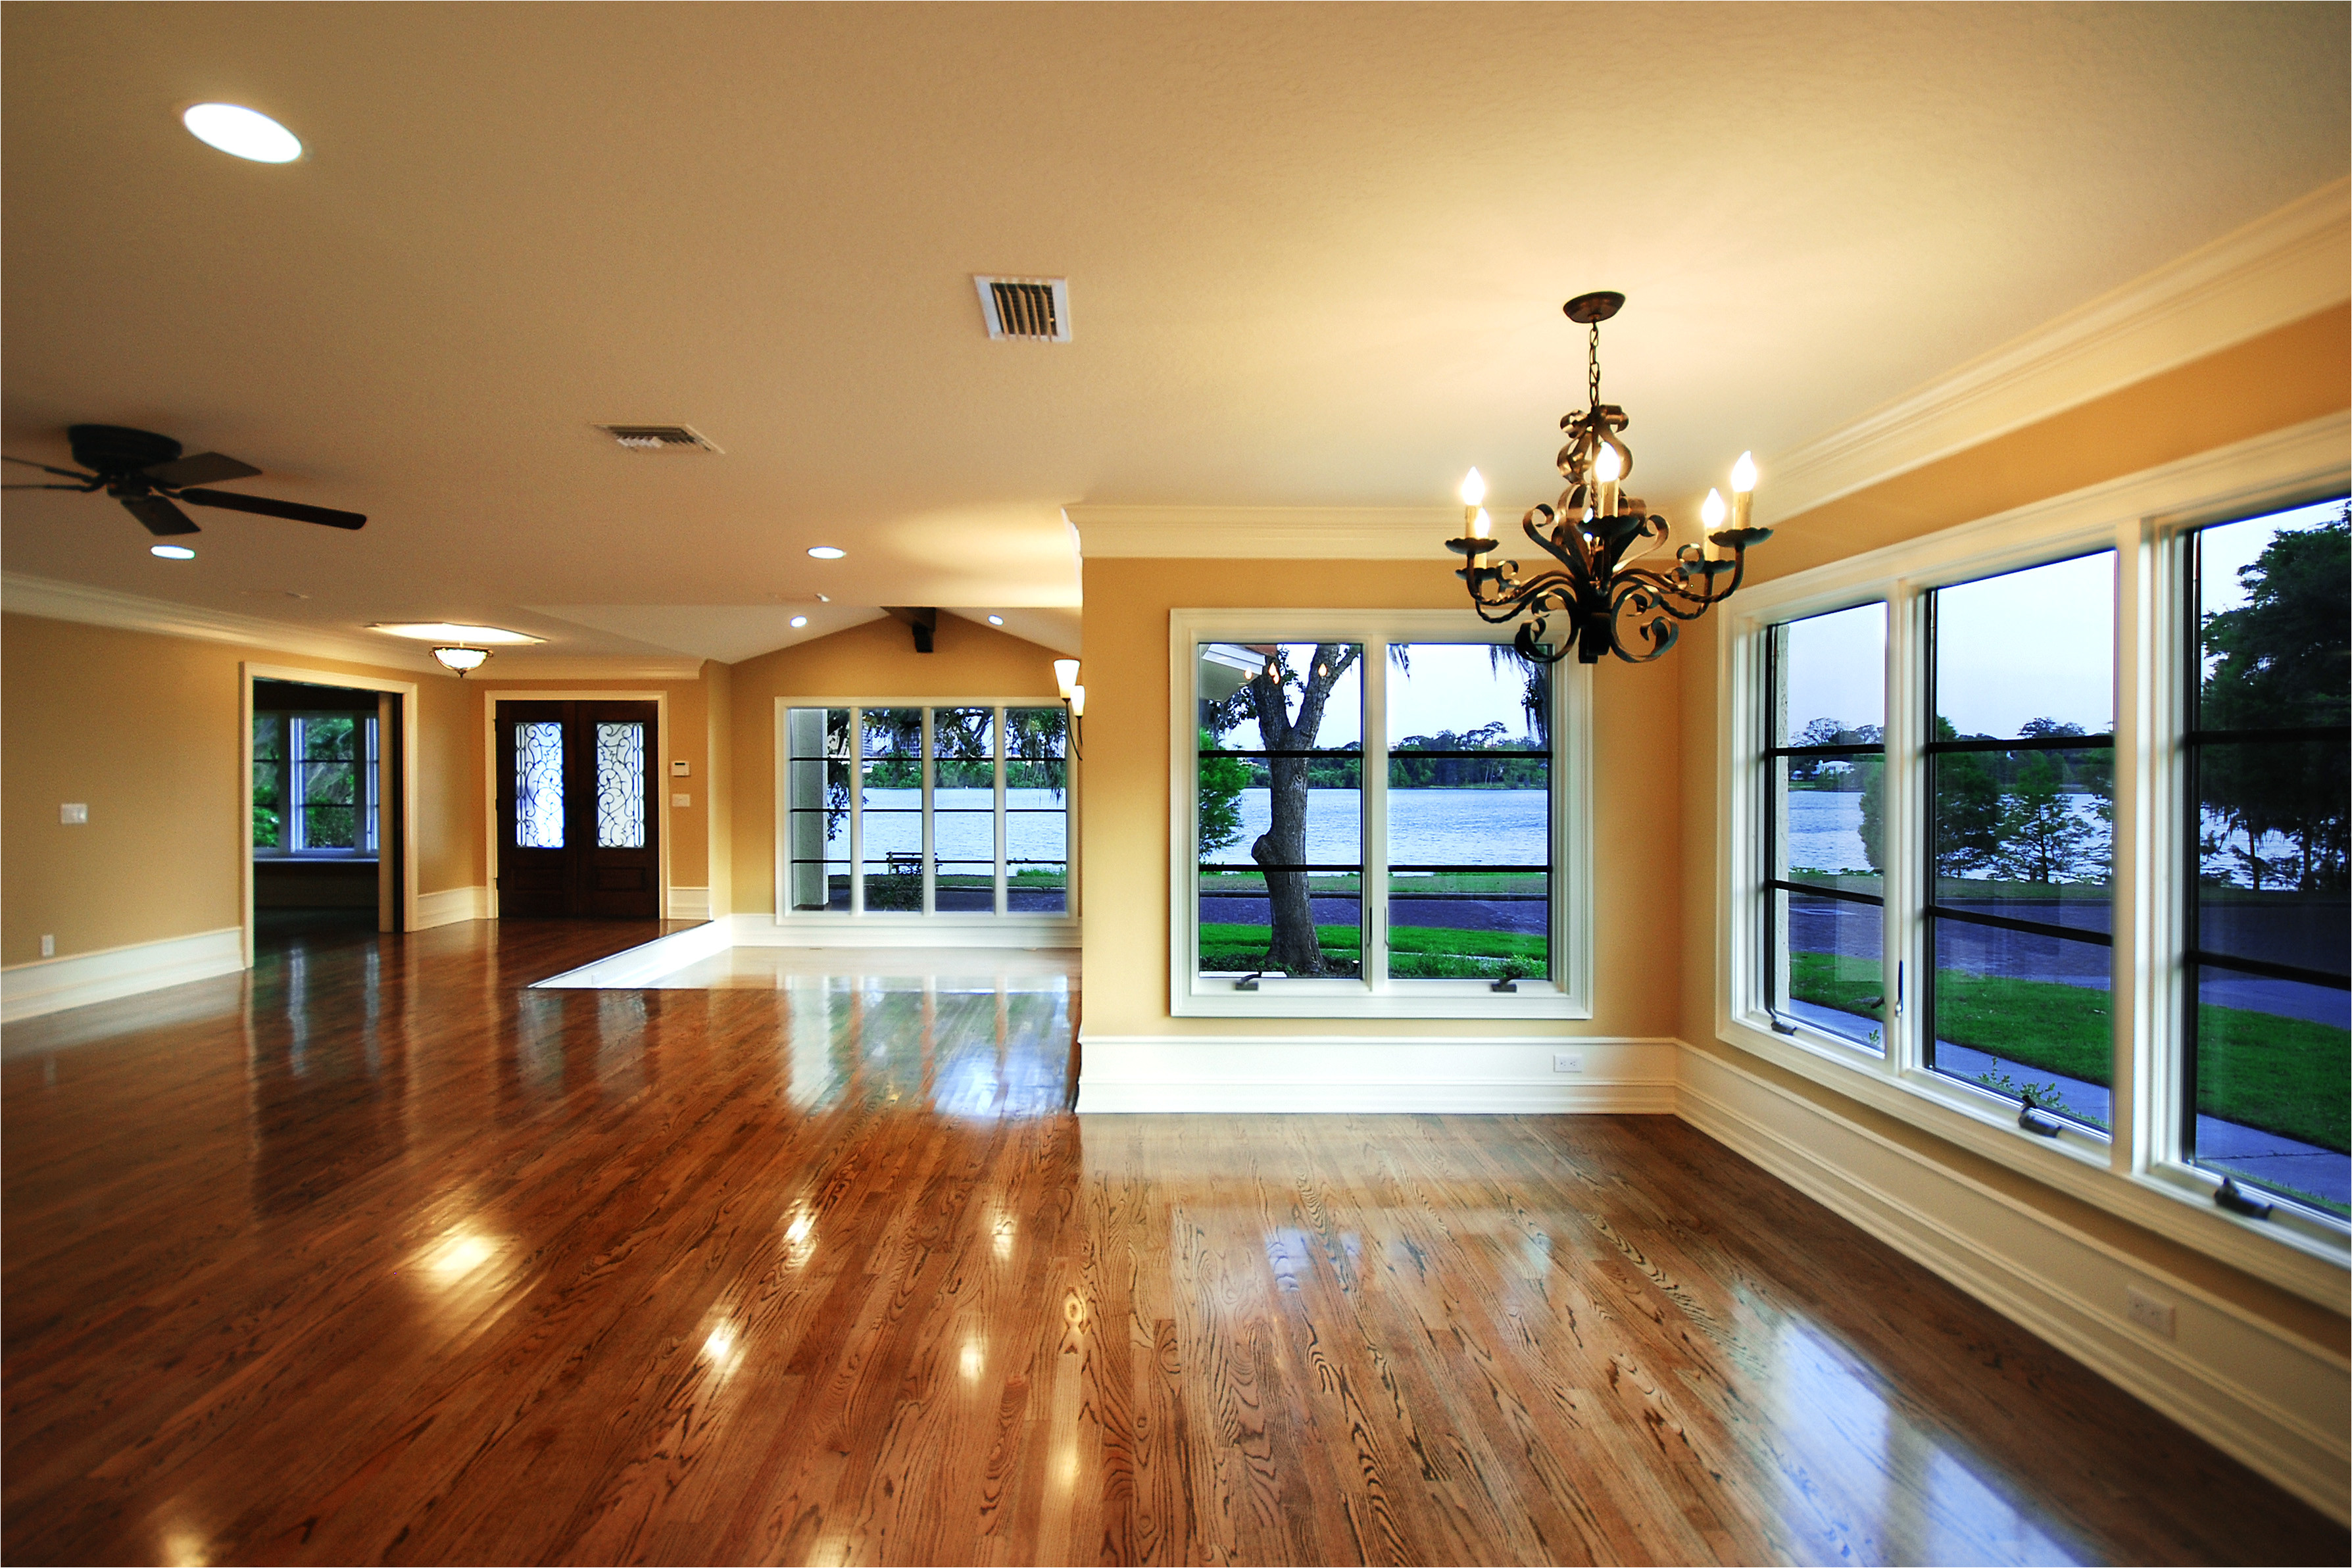 home renovations impress buyers